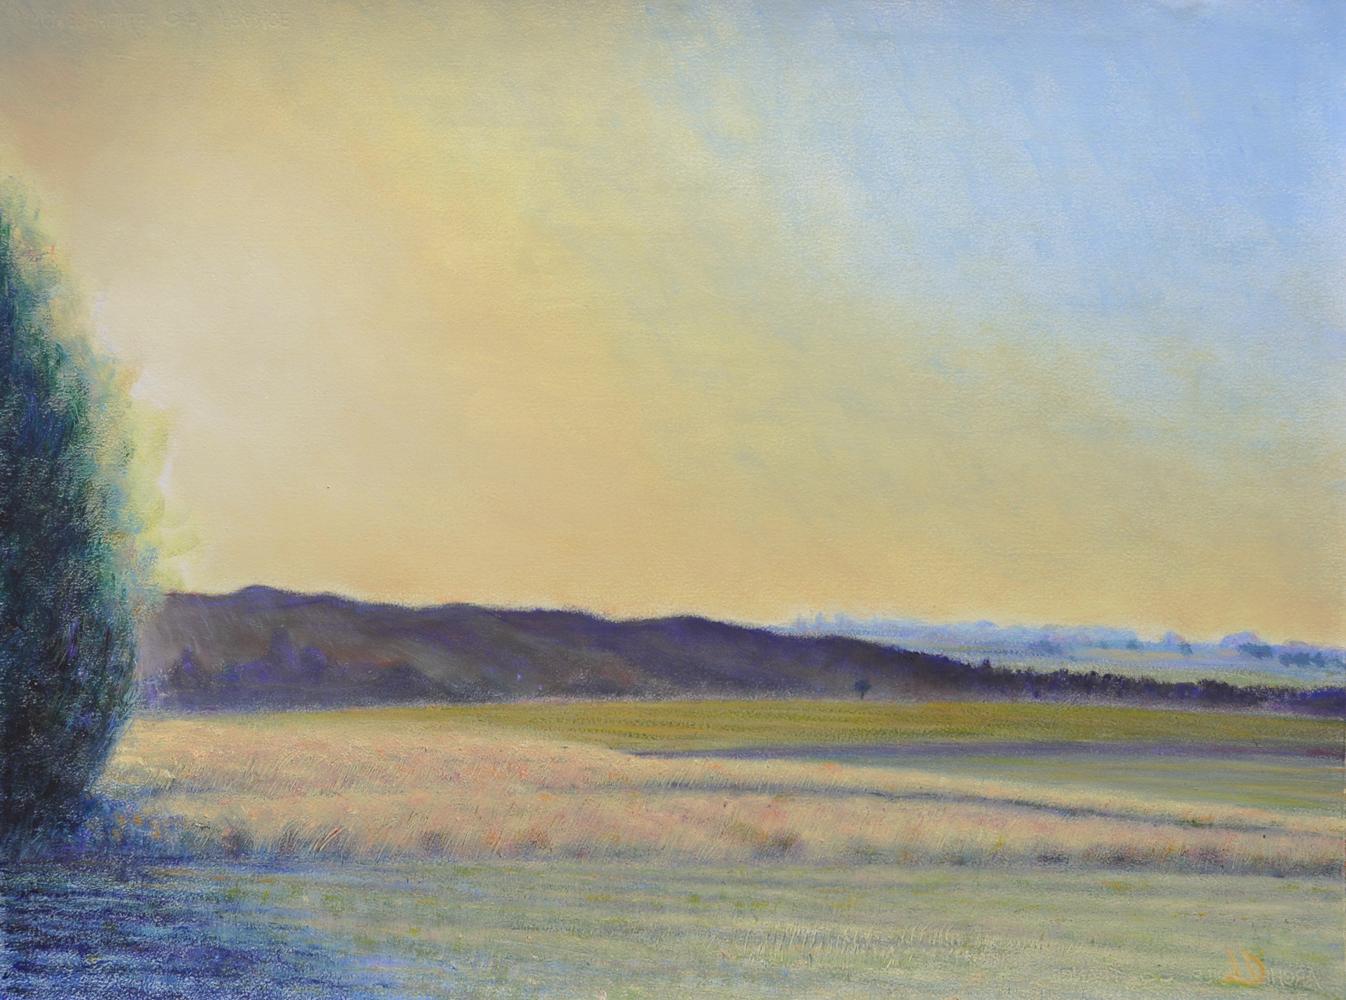 Fields, Penthalaz no. 3. Oil on paper, 56x76, 2017